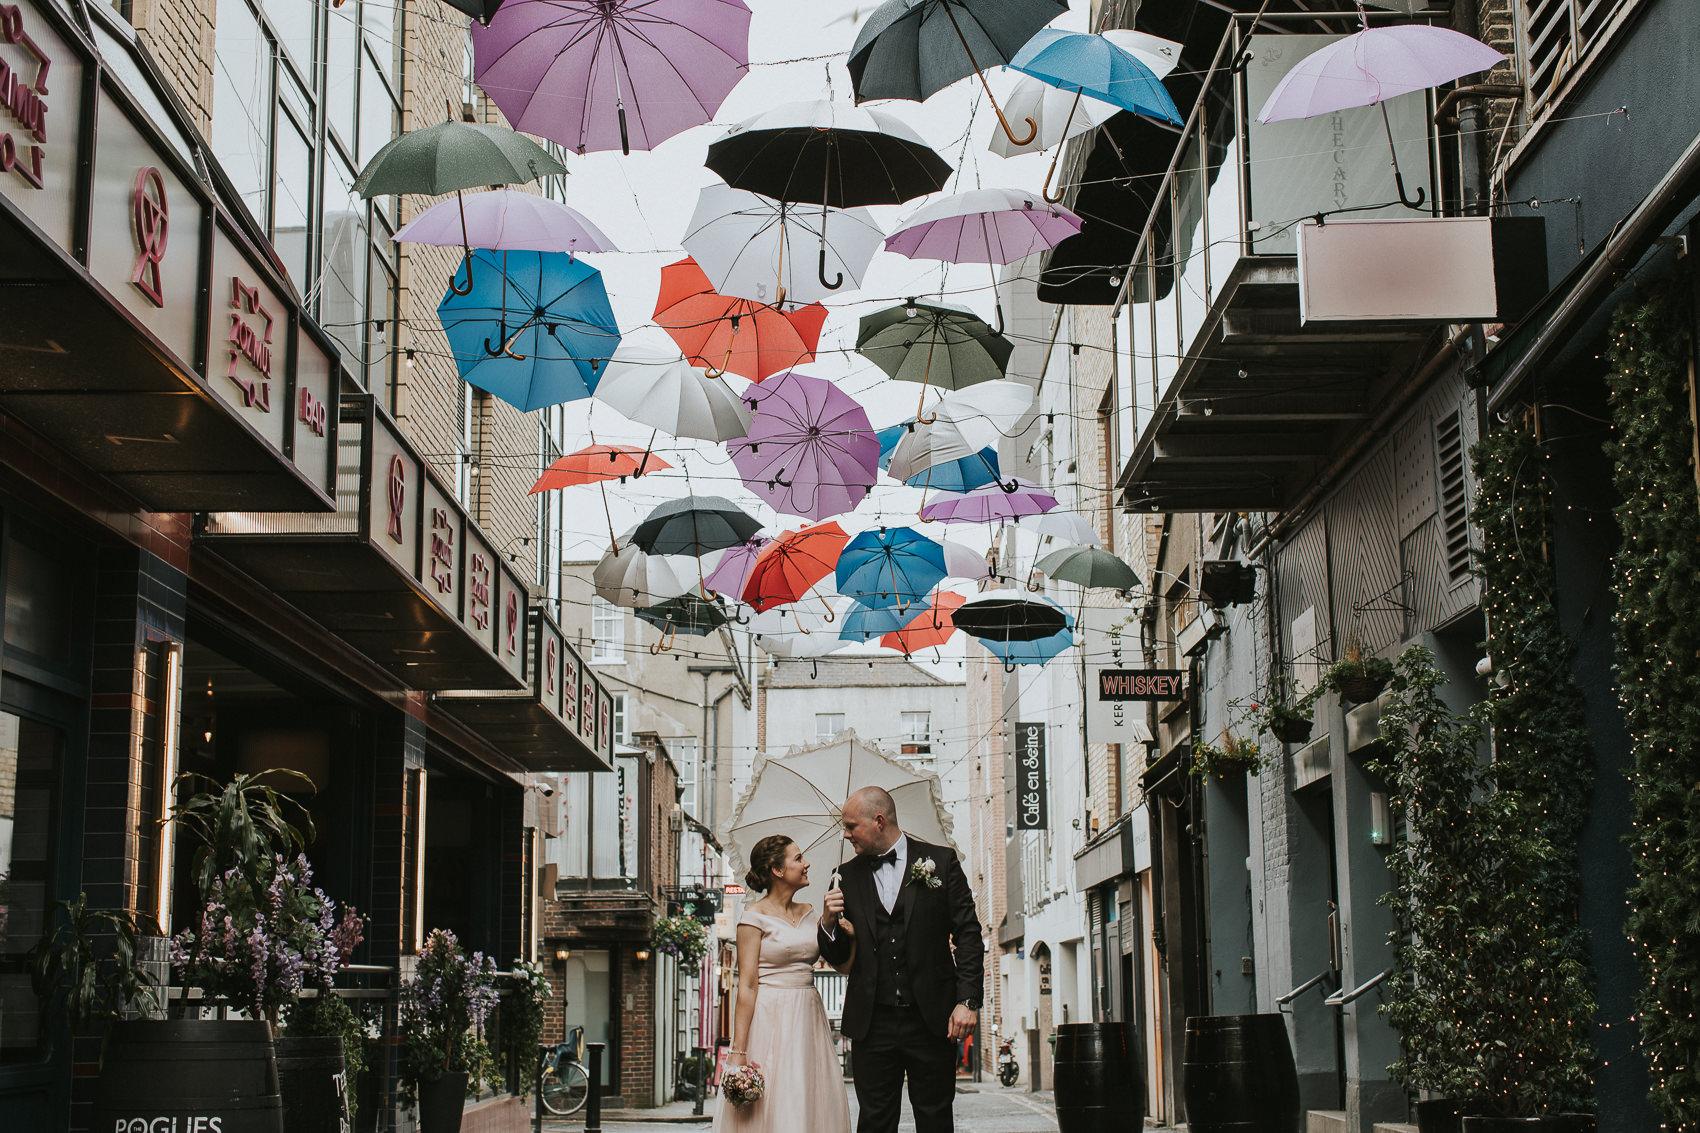 Photography by Ciara - wedding photographer 3